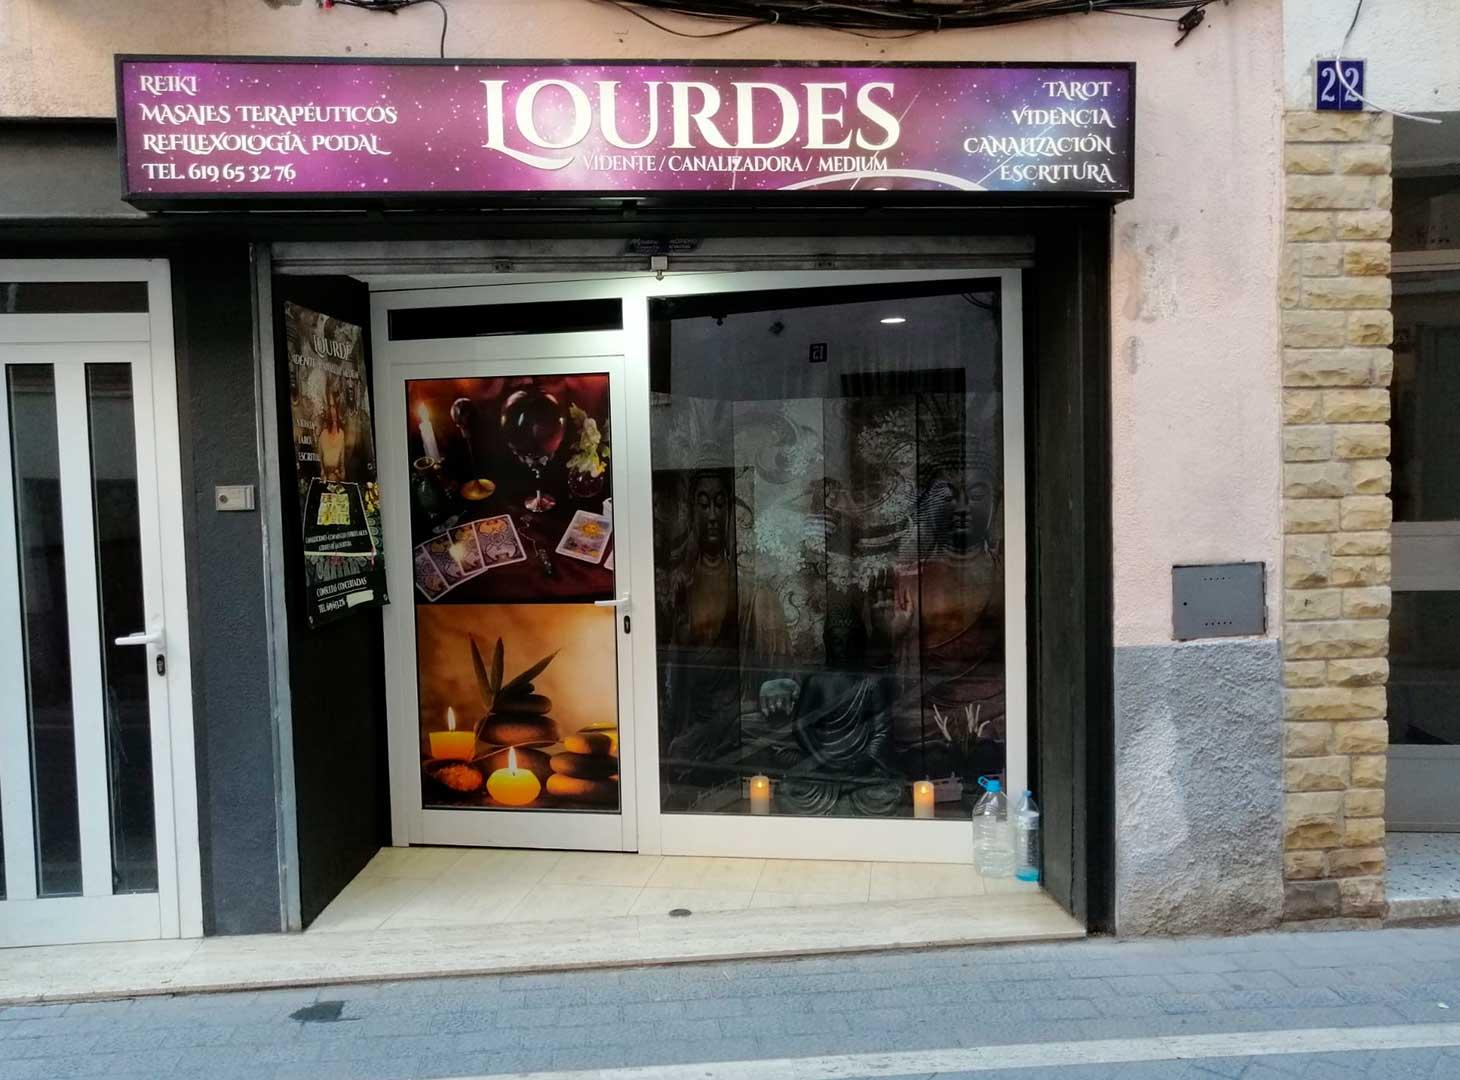 REIKI EN EL VENDRELL Lourdes